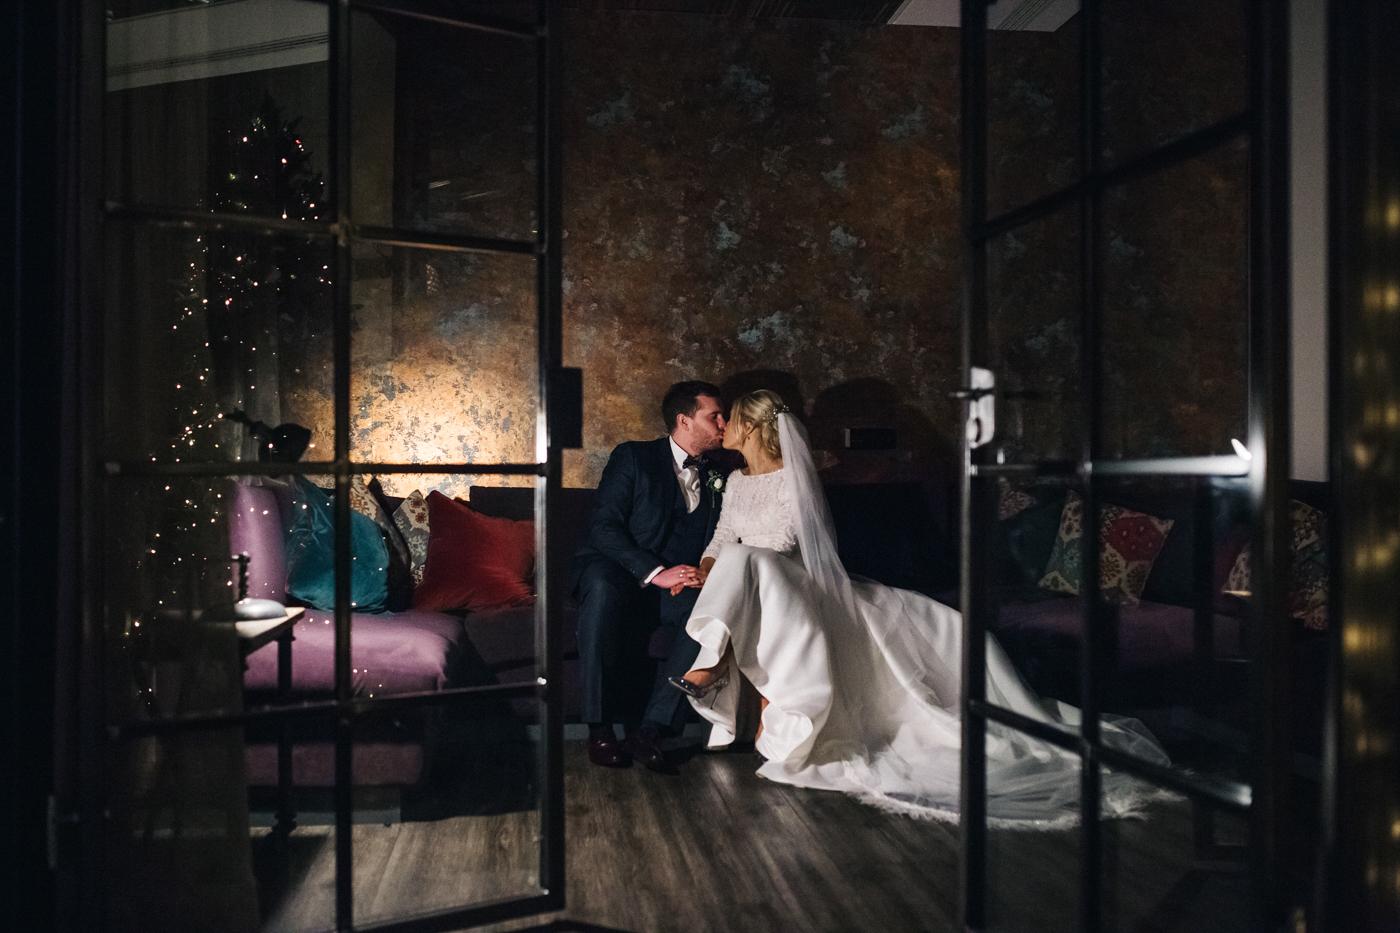 teesside-middlesbrough-north-east-wedding-photographer-creative-wedding-venues-0213.jpg